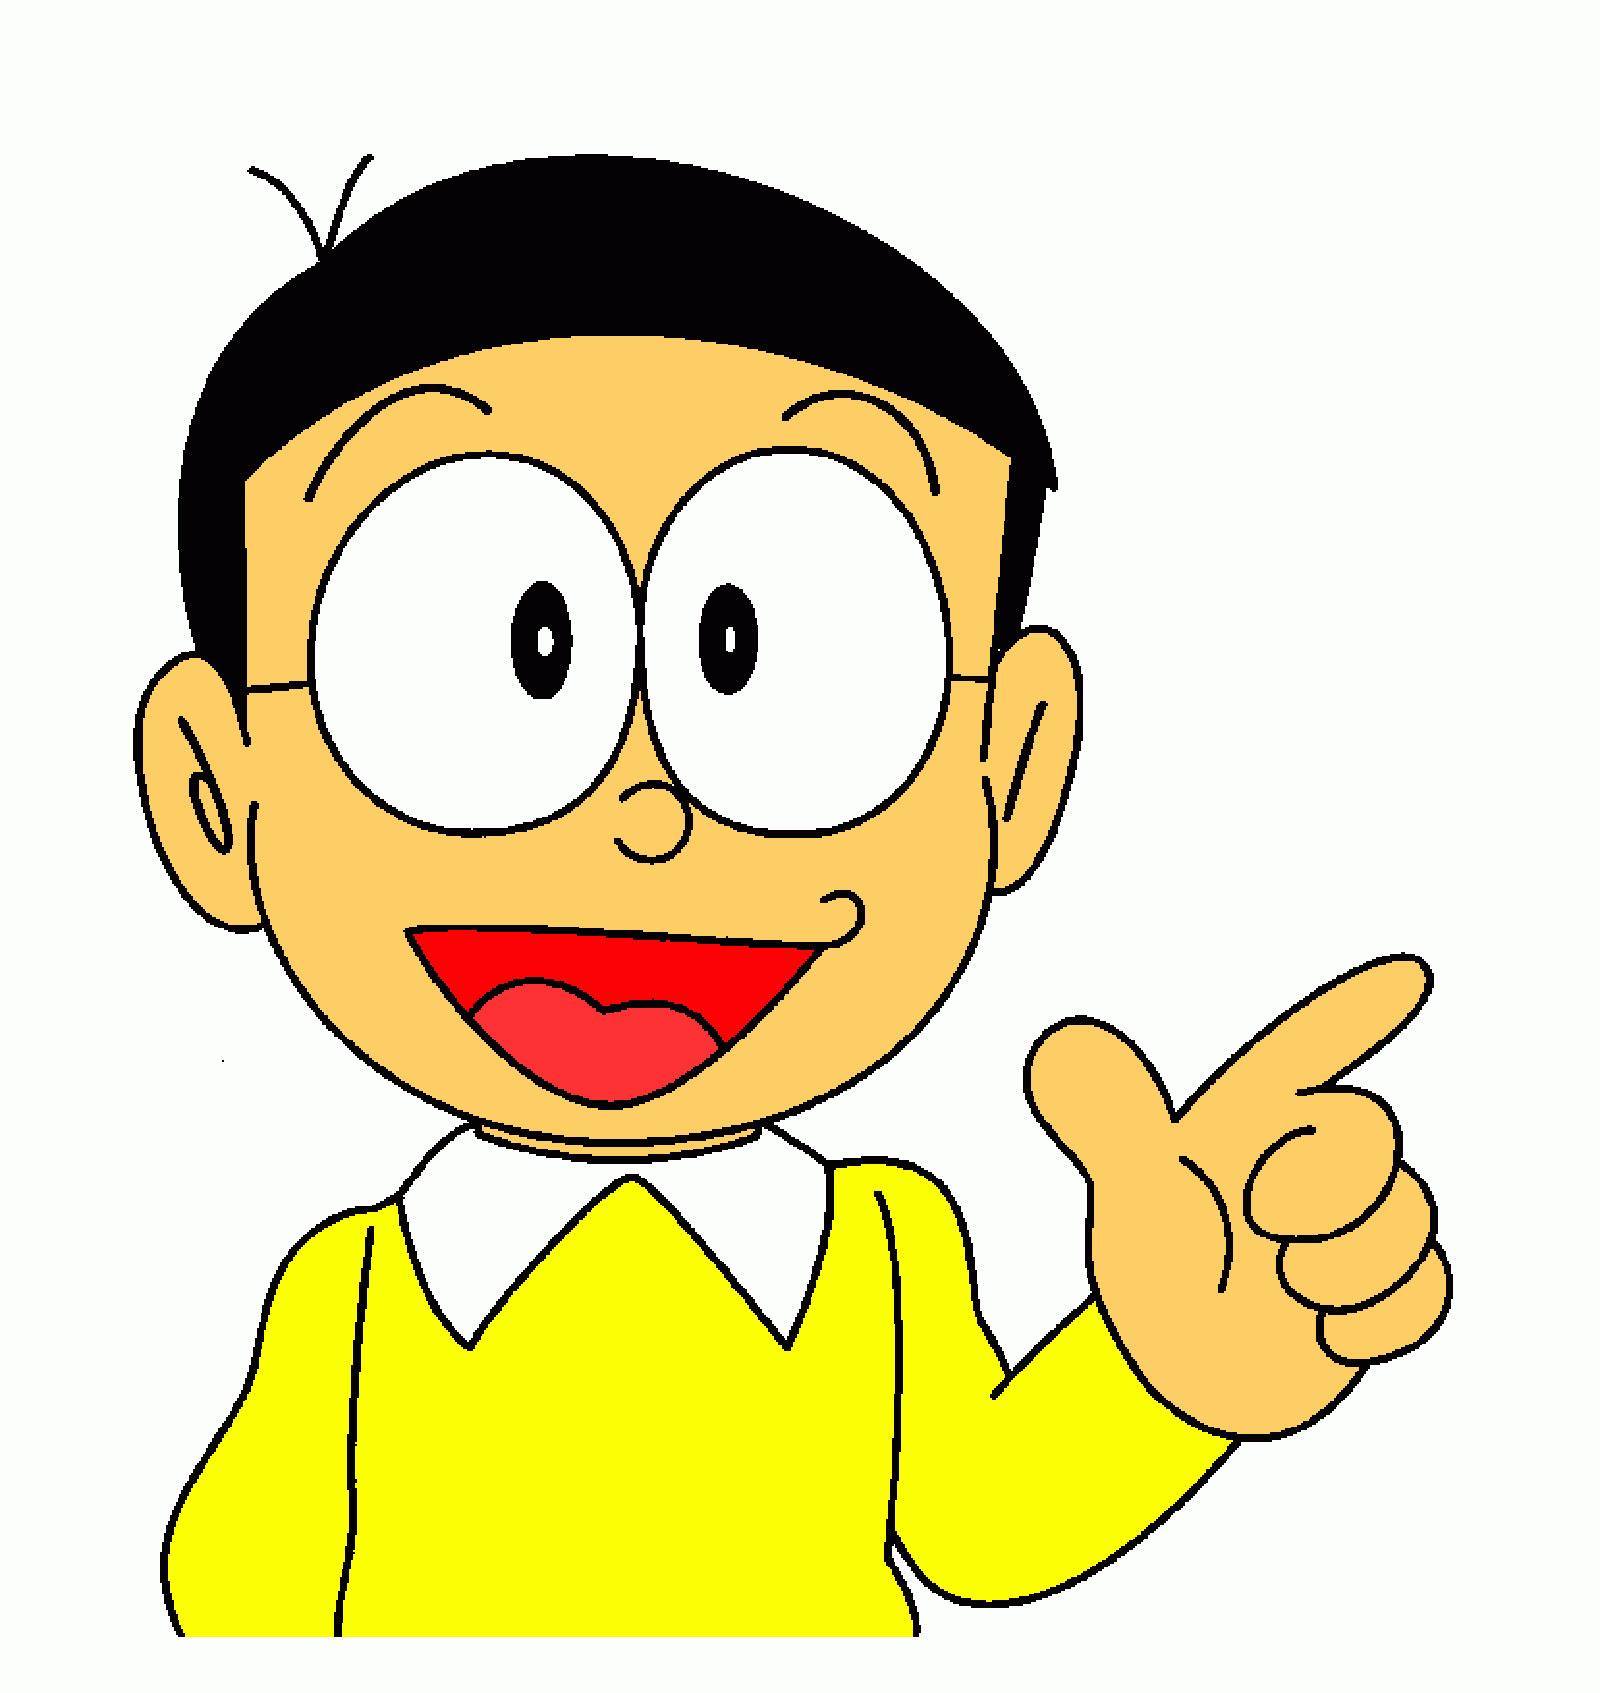 Image - Nobita And Doraemon Hd Images Cute.jpg